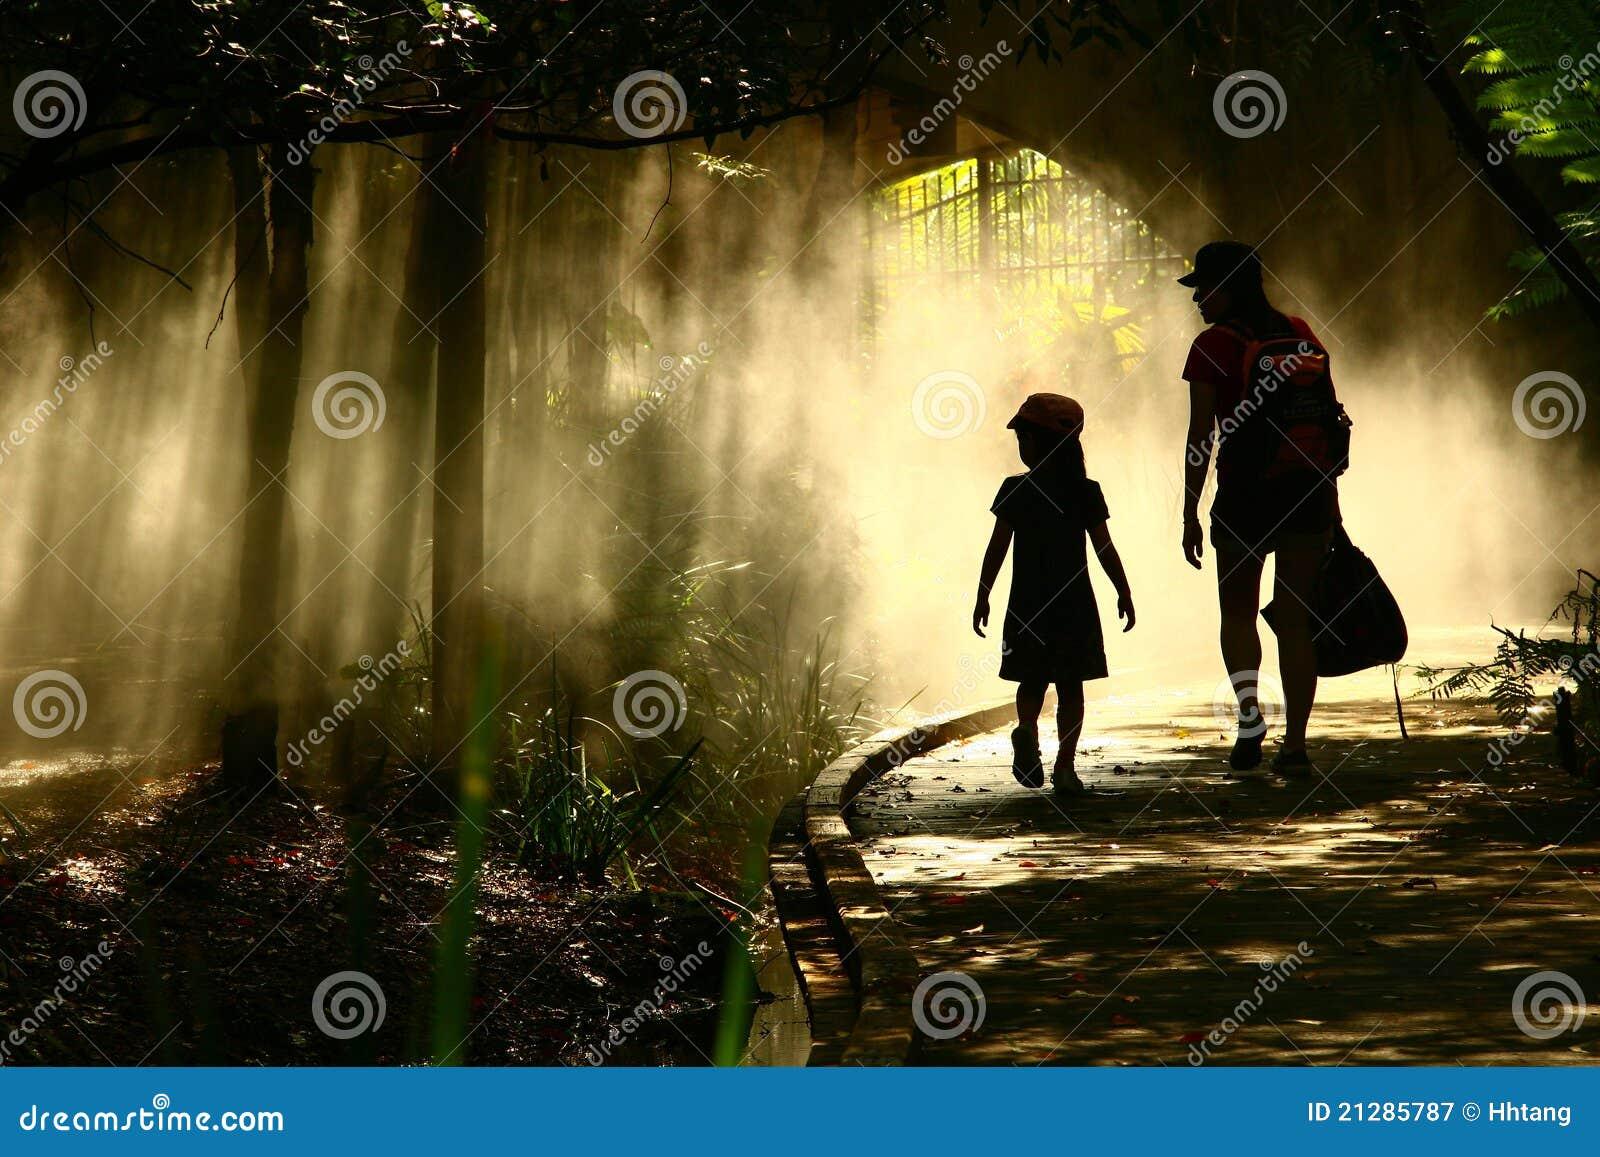 Journey in the mystical garden